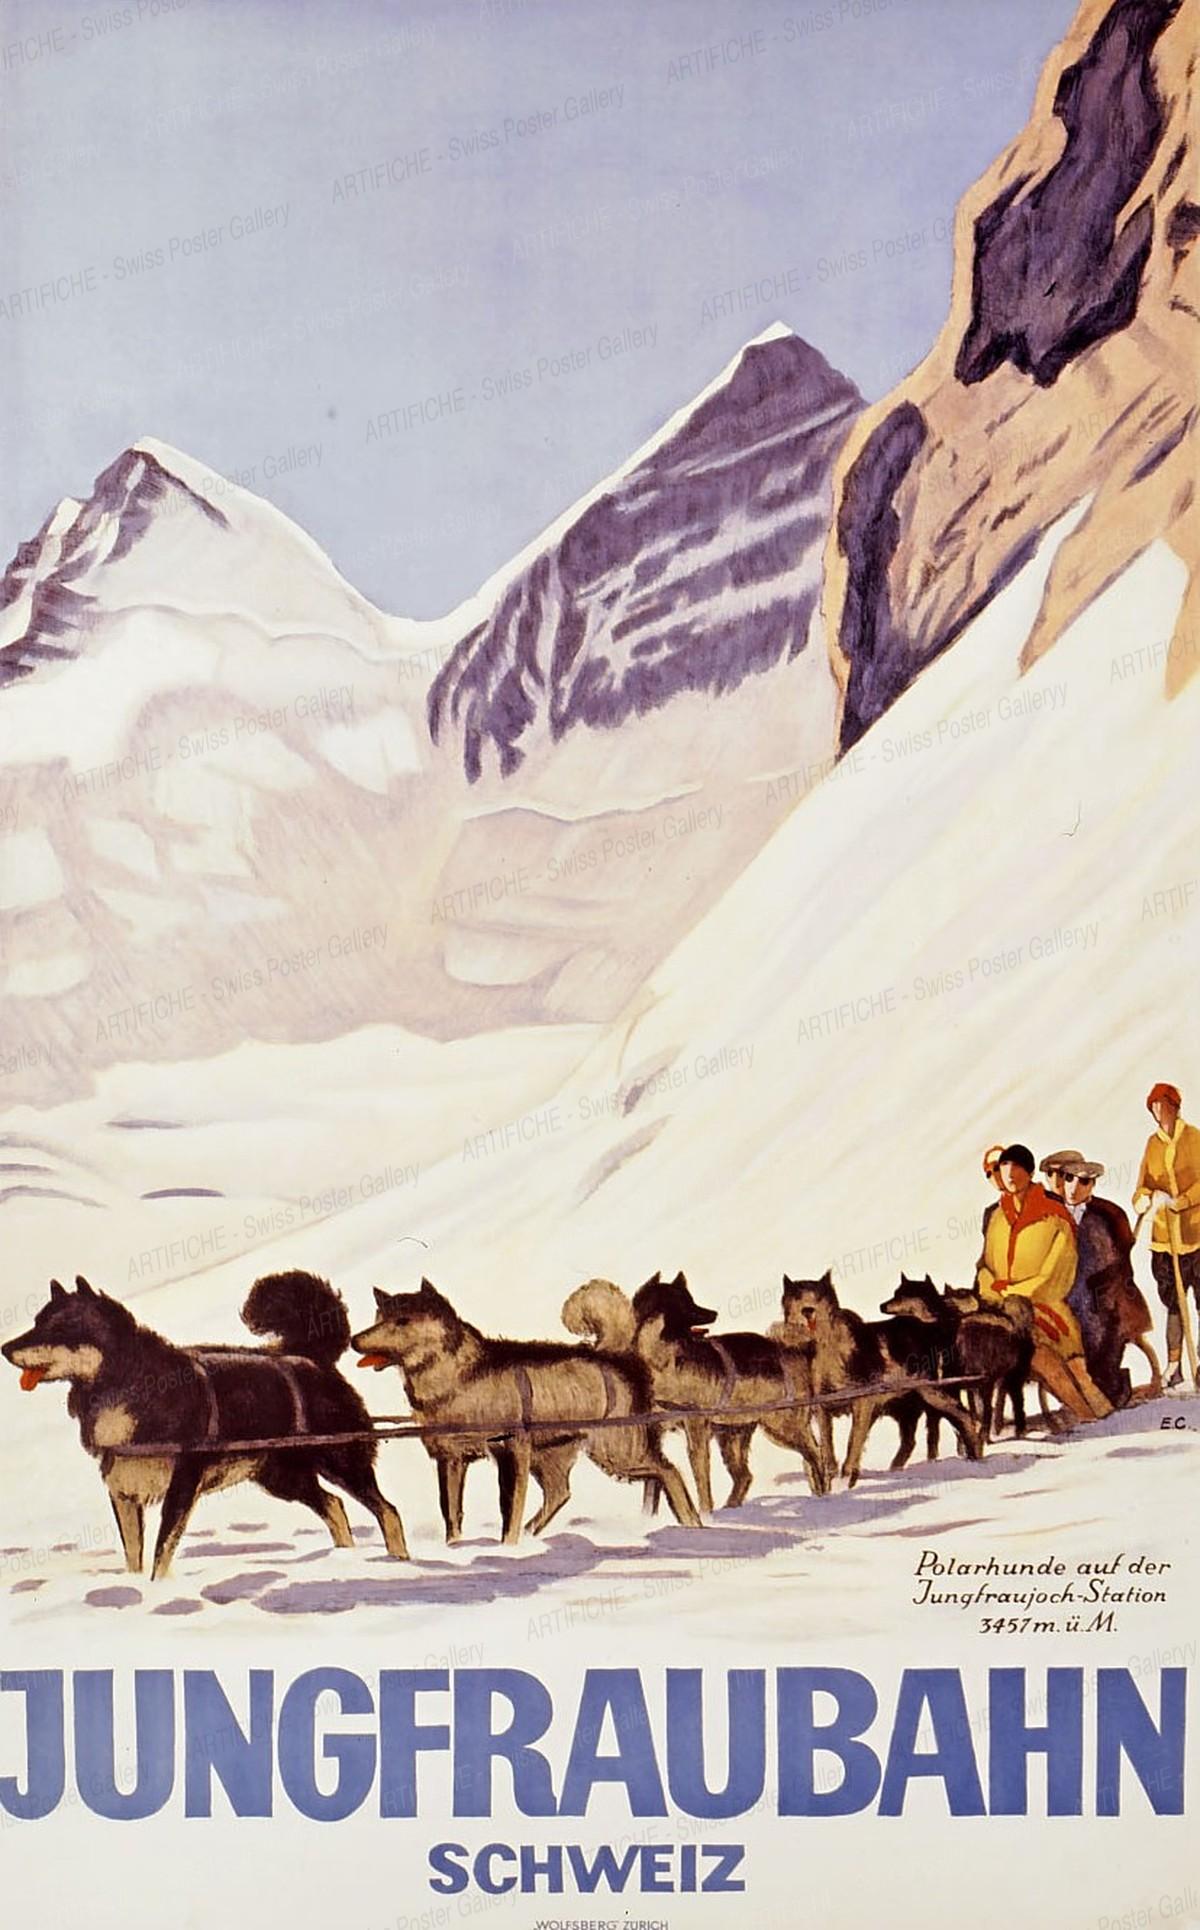 JUNGFRAUBAHN – SCHWEIZ – Polarhunde auf der Jungfraujoch-Station – 3457 m. ü. M., Emil Cardinaux